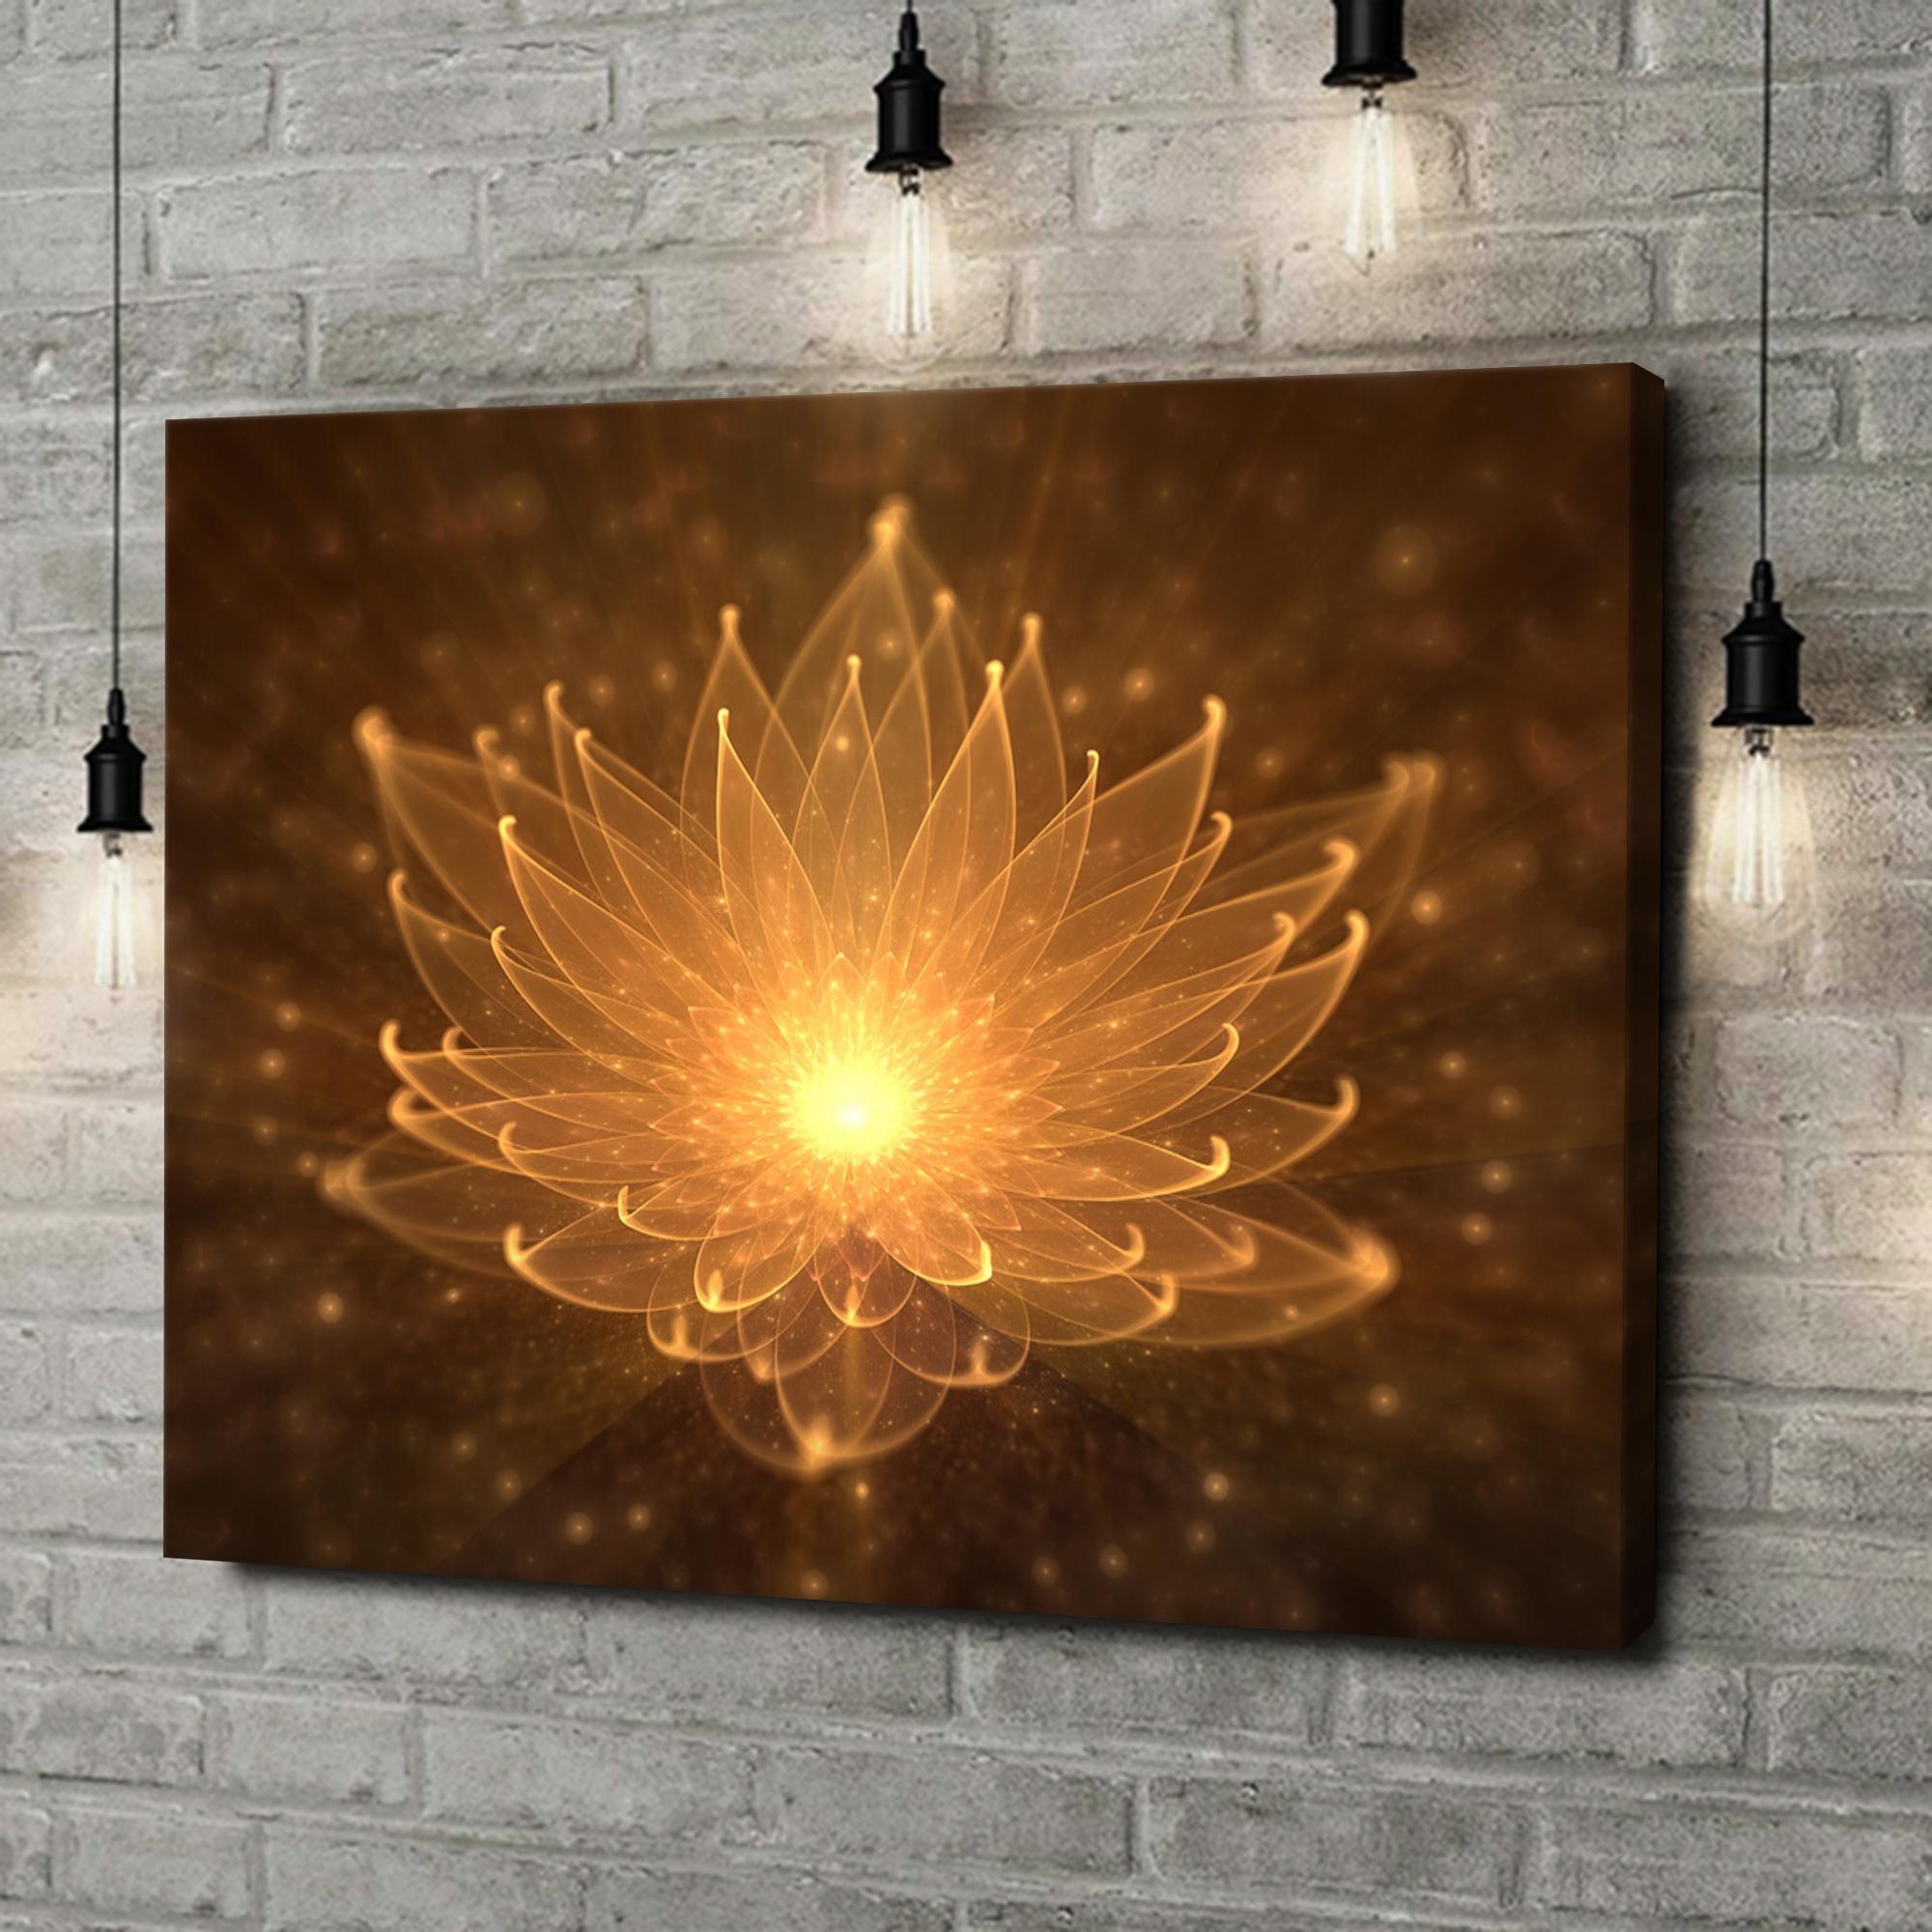 Leinwandbild personalisiert Lotusblüte